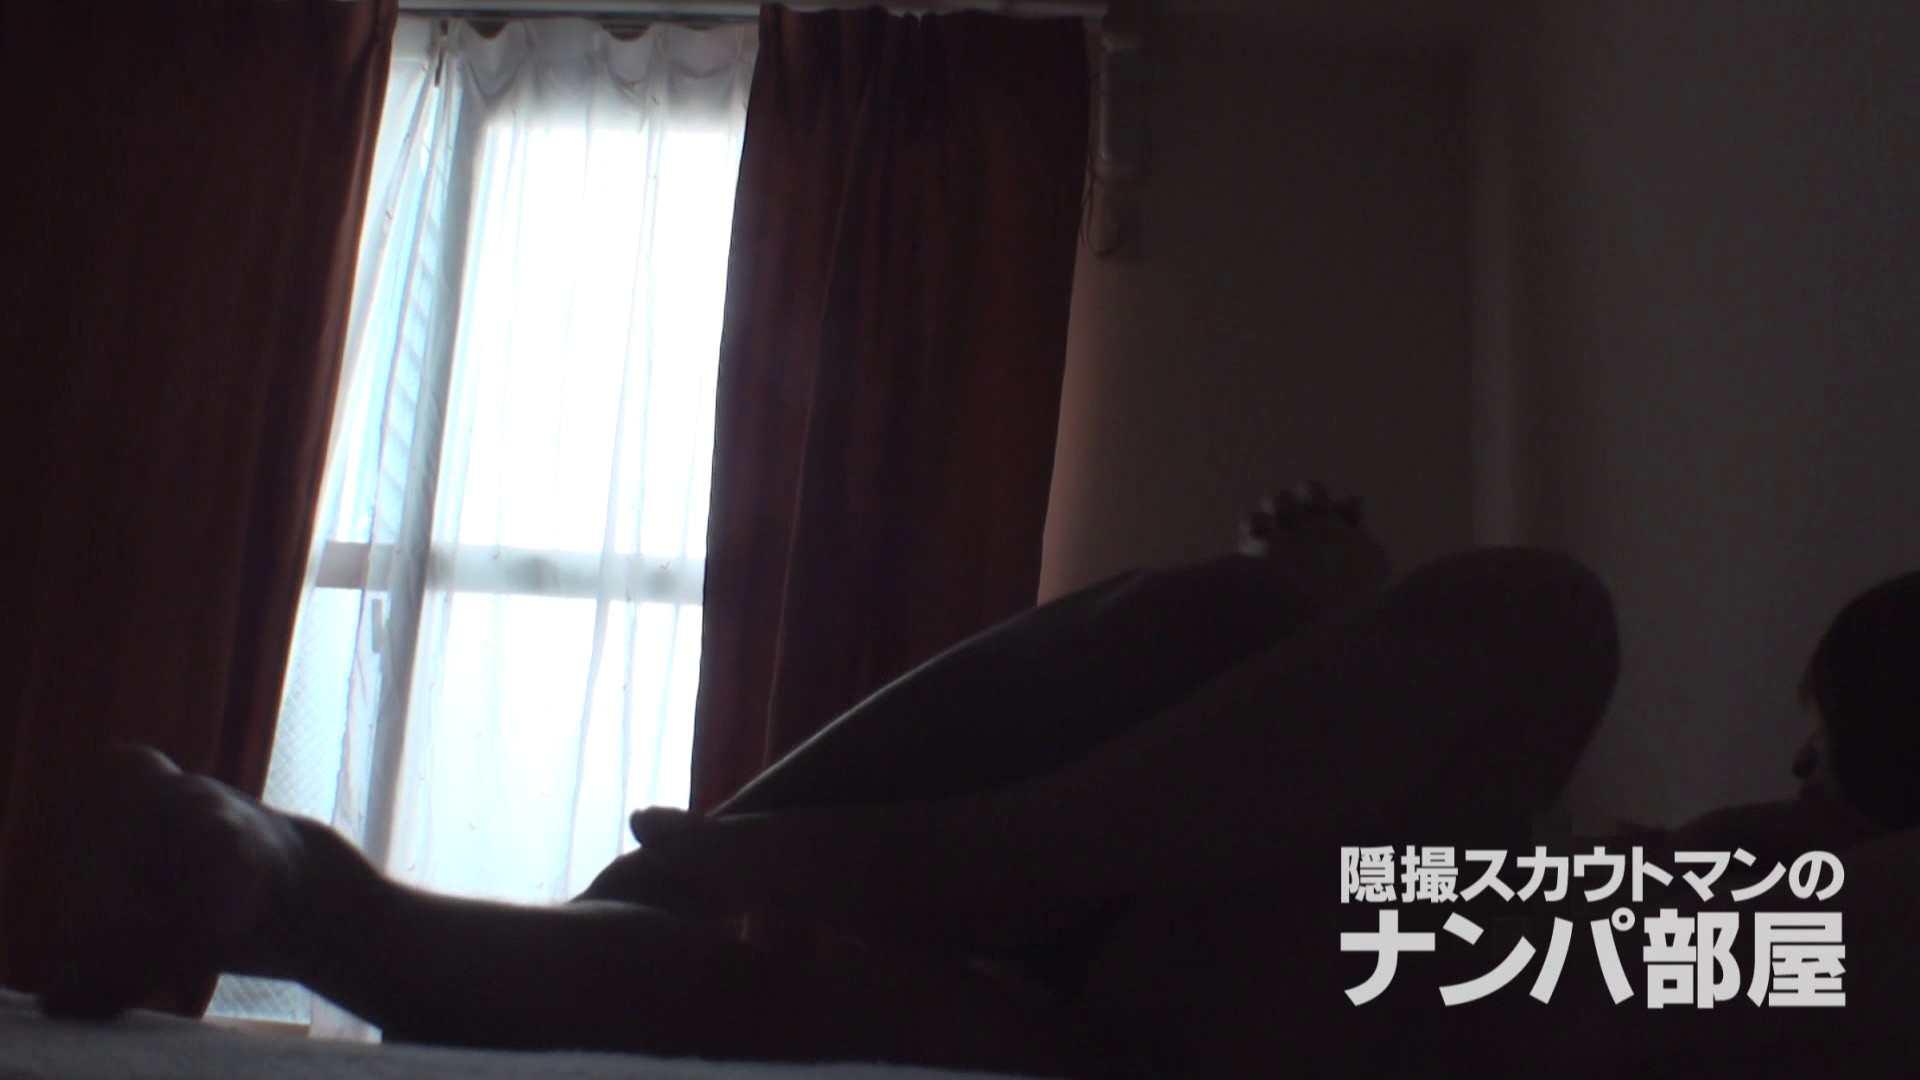 sii ナンパ | 脱衣所・着替え編  93pic 25